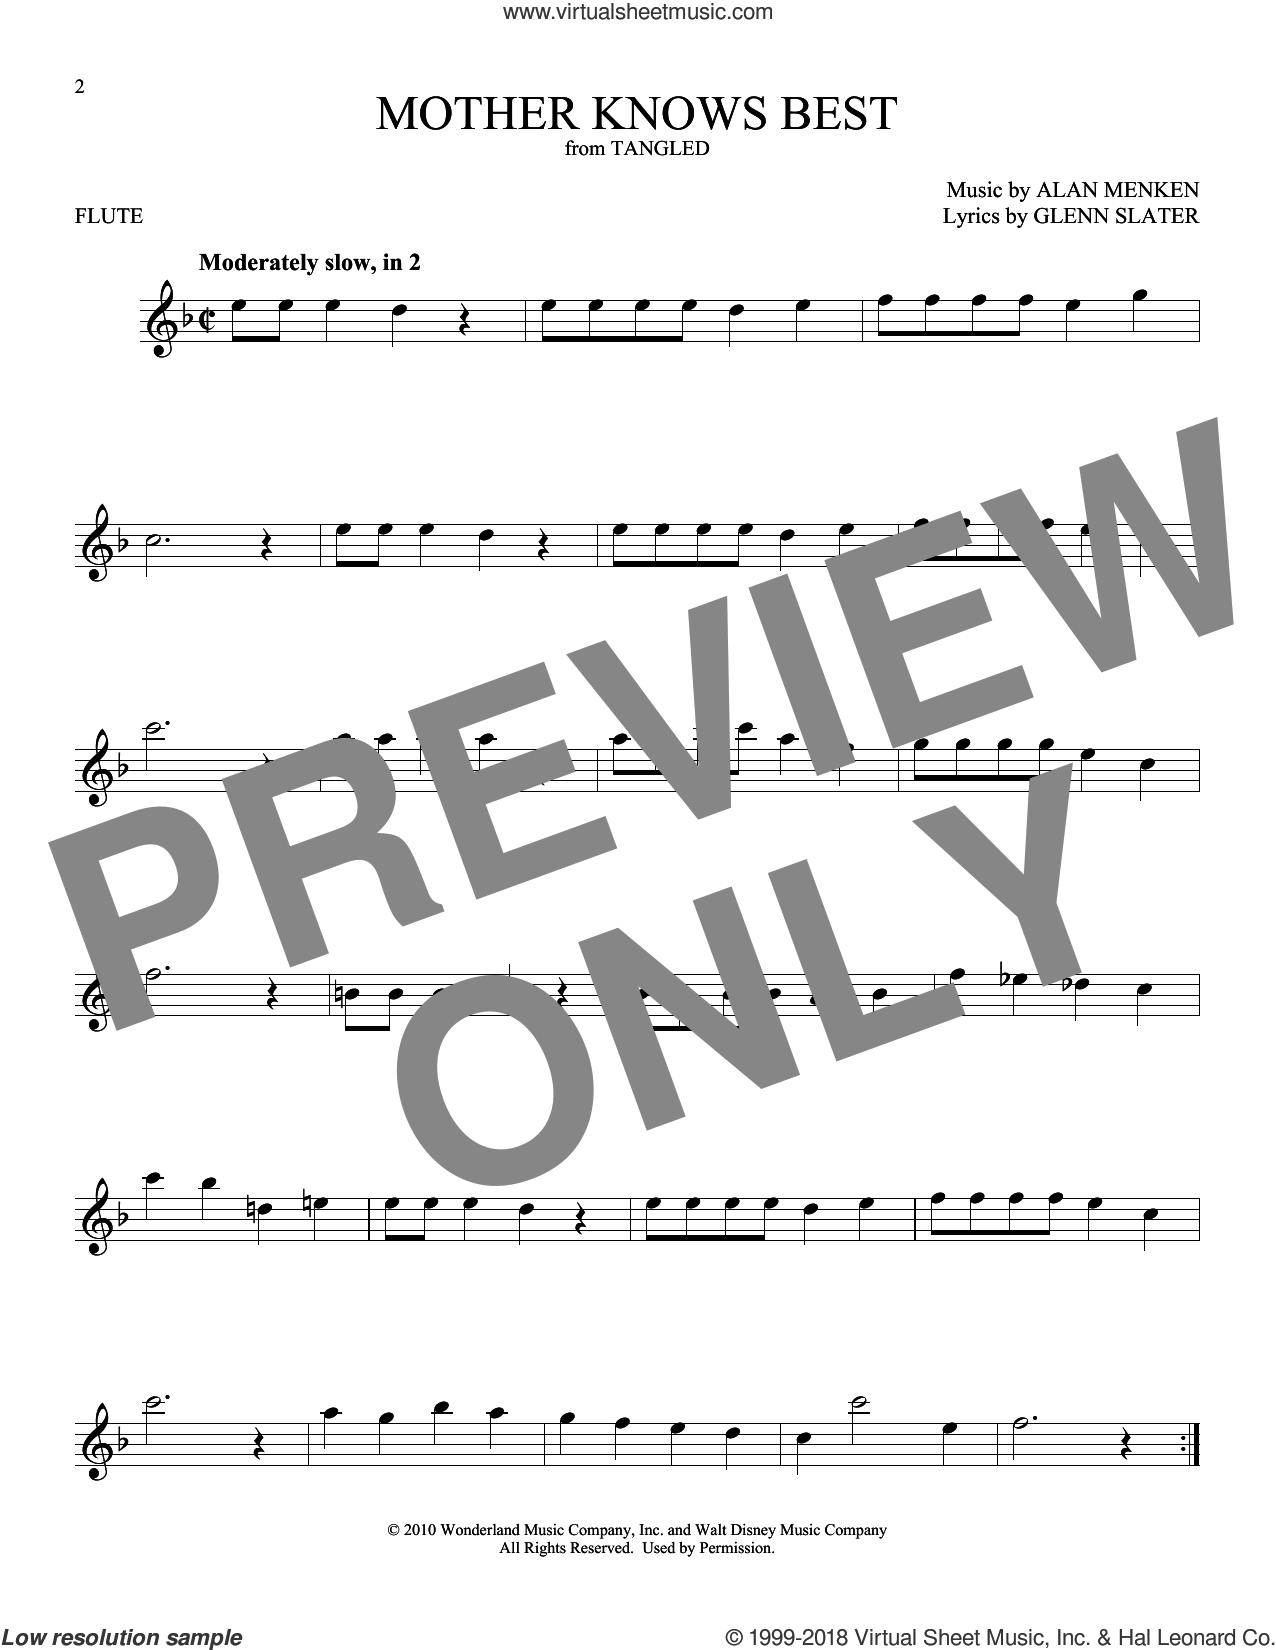 Mother Knows Best sheet music for flute solo by Alan Menken and Glenn Slater, intermediate skill level